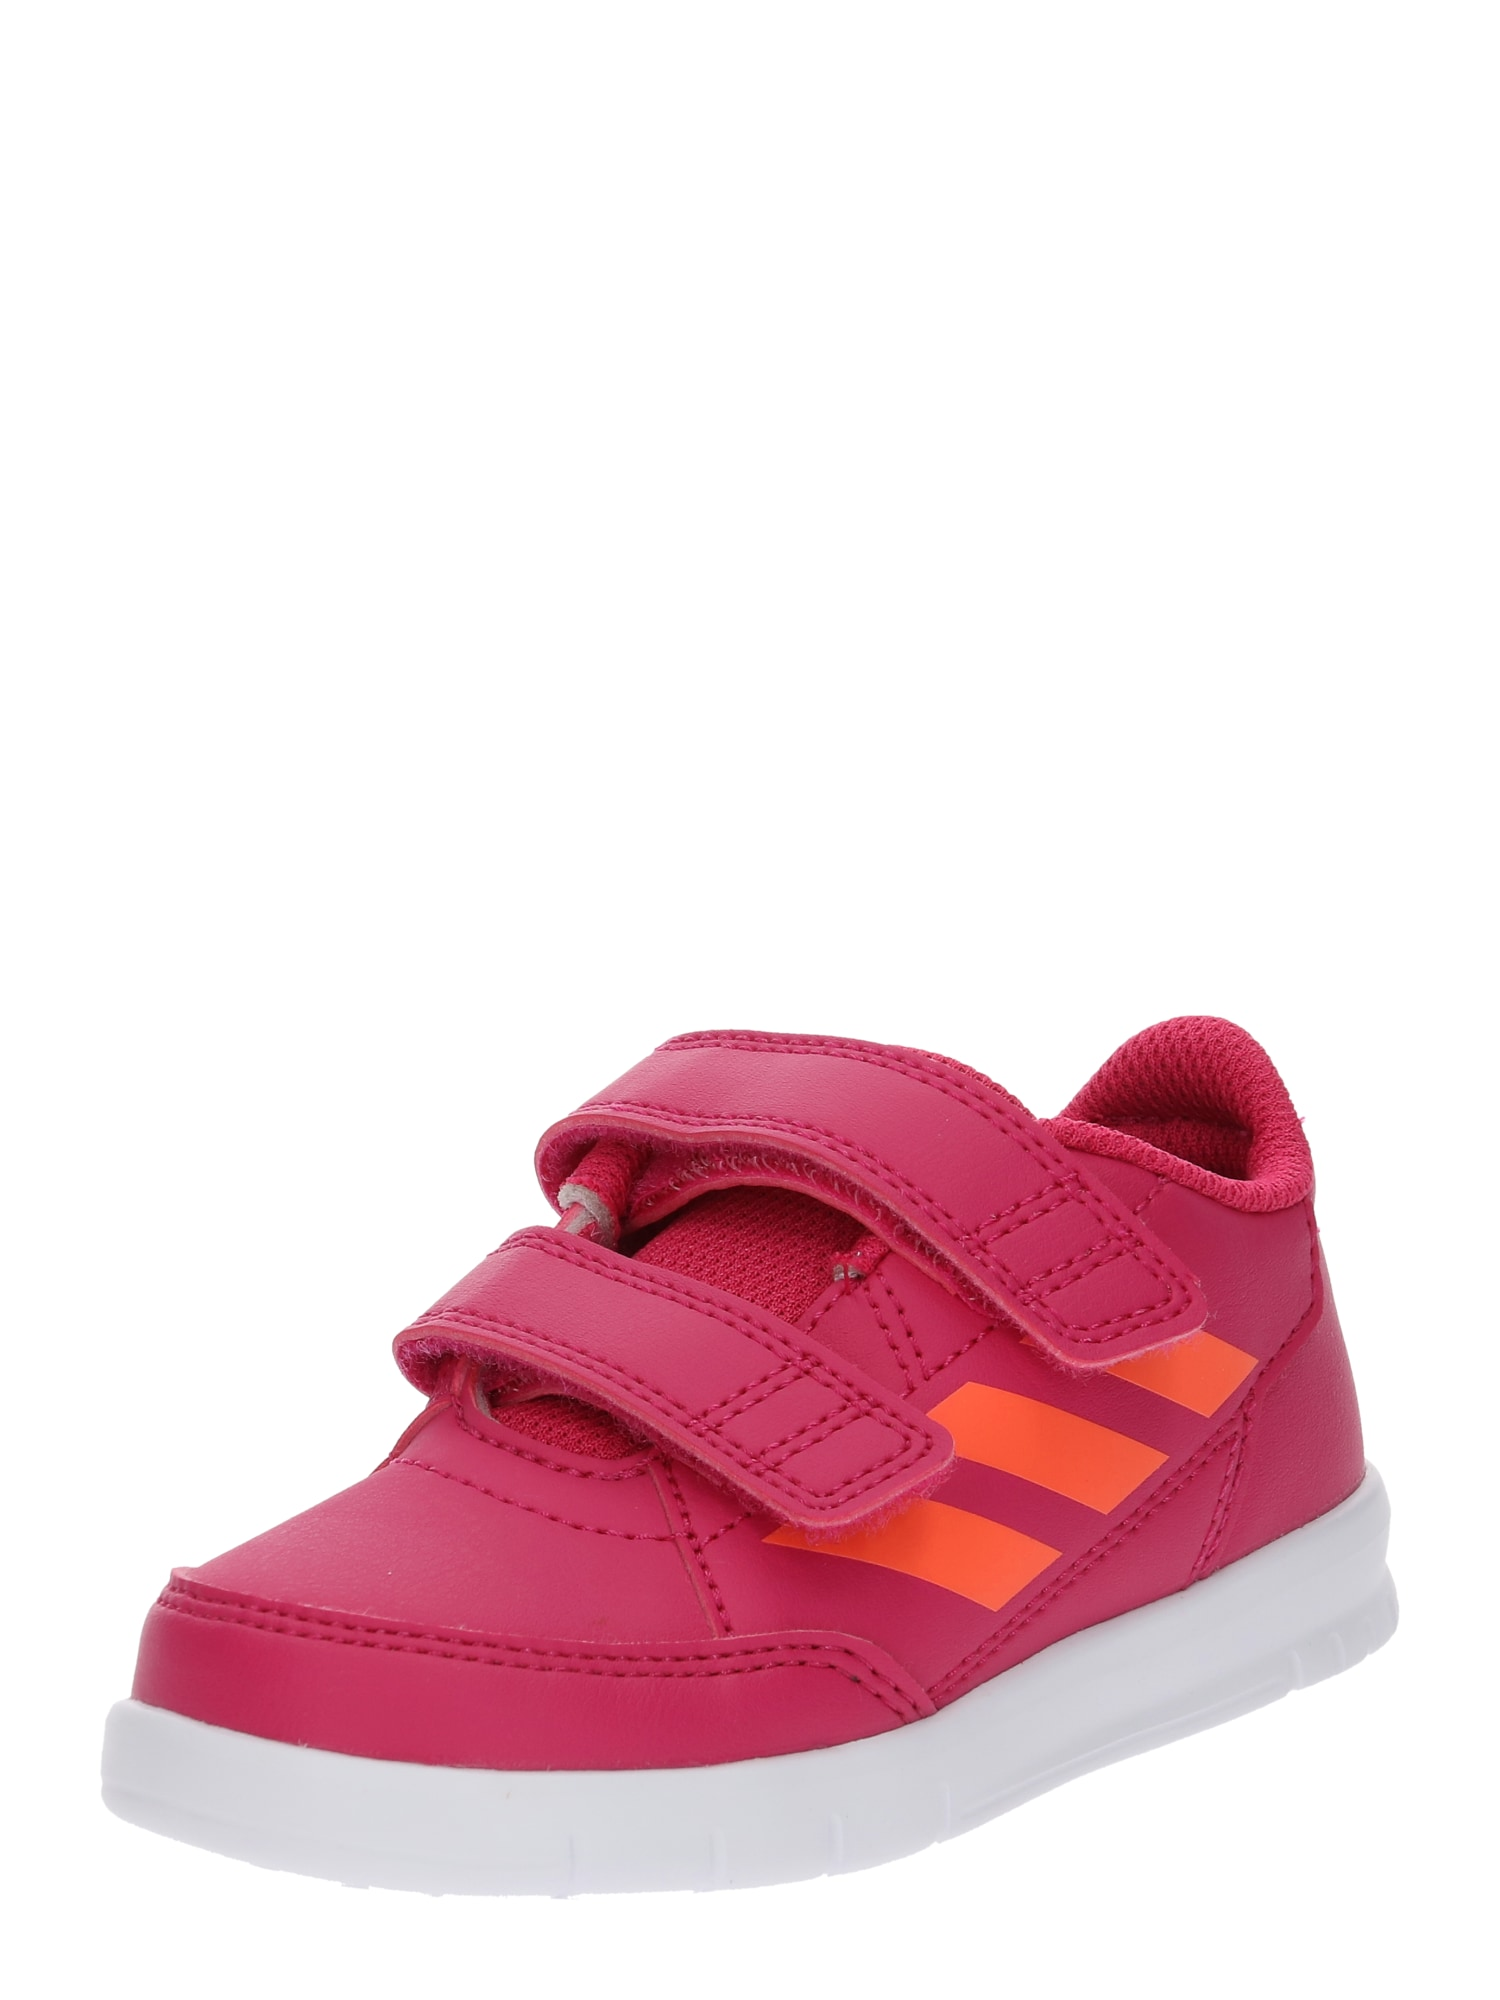 Sportovní boty AltaSport CF I pink ADIDAS PERFORMANCE